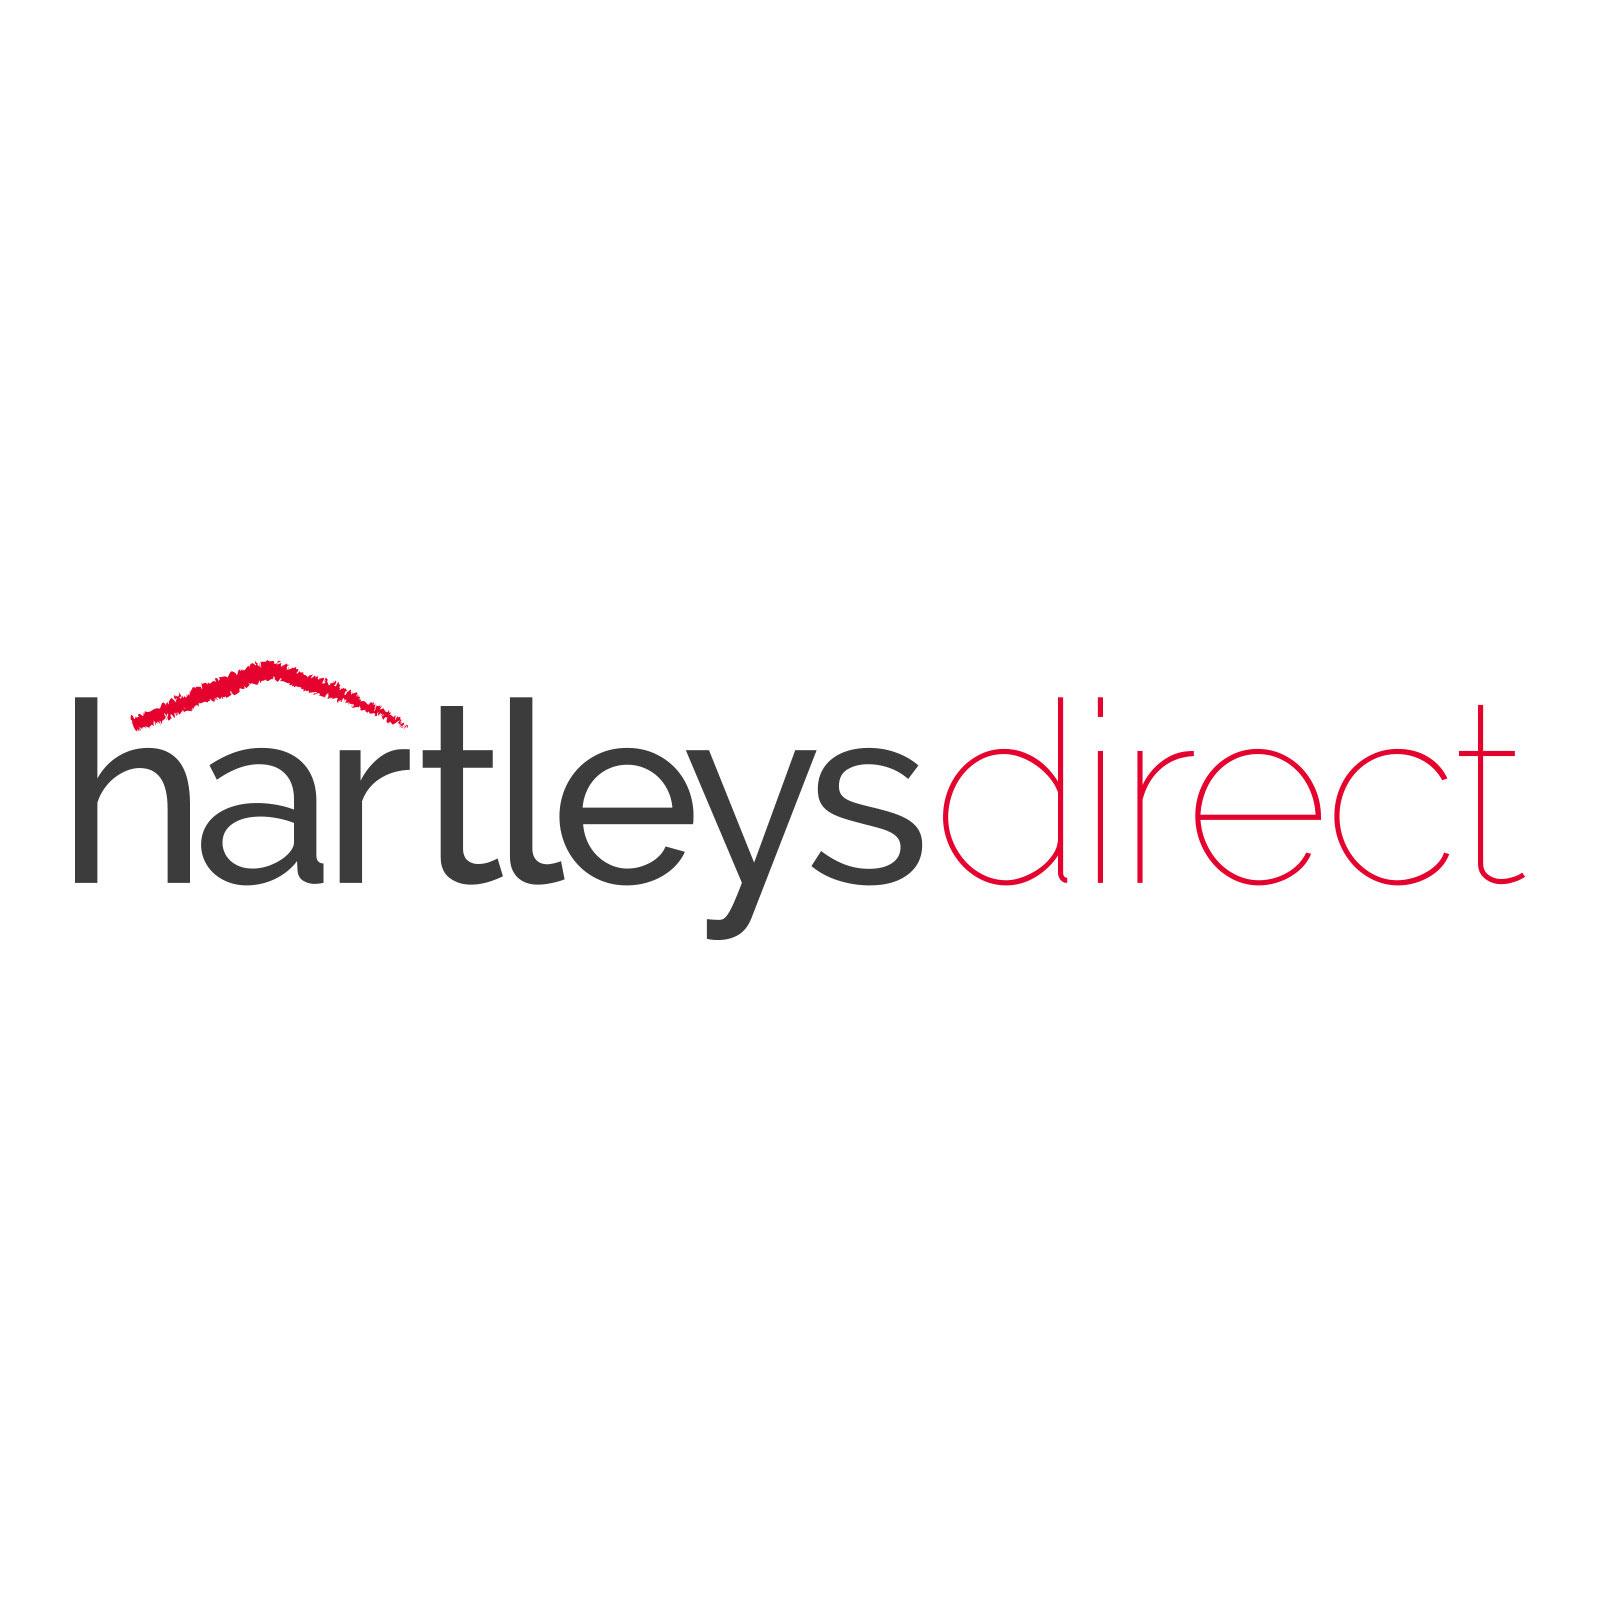 Hartleys-Set-of-5-Wicker-Storage-Boxes-in-Use-on-Wooden-Floor.jpg